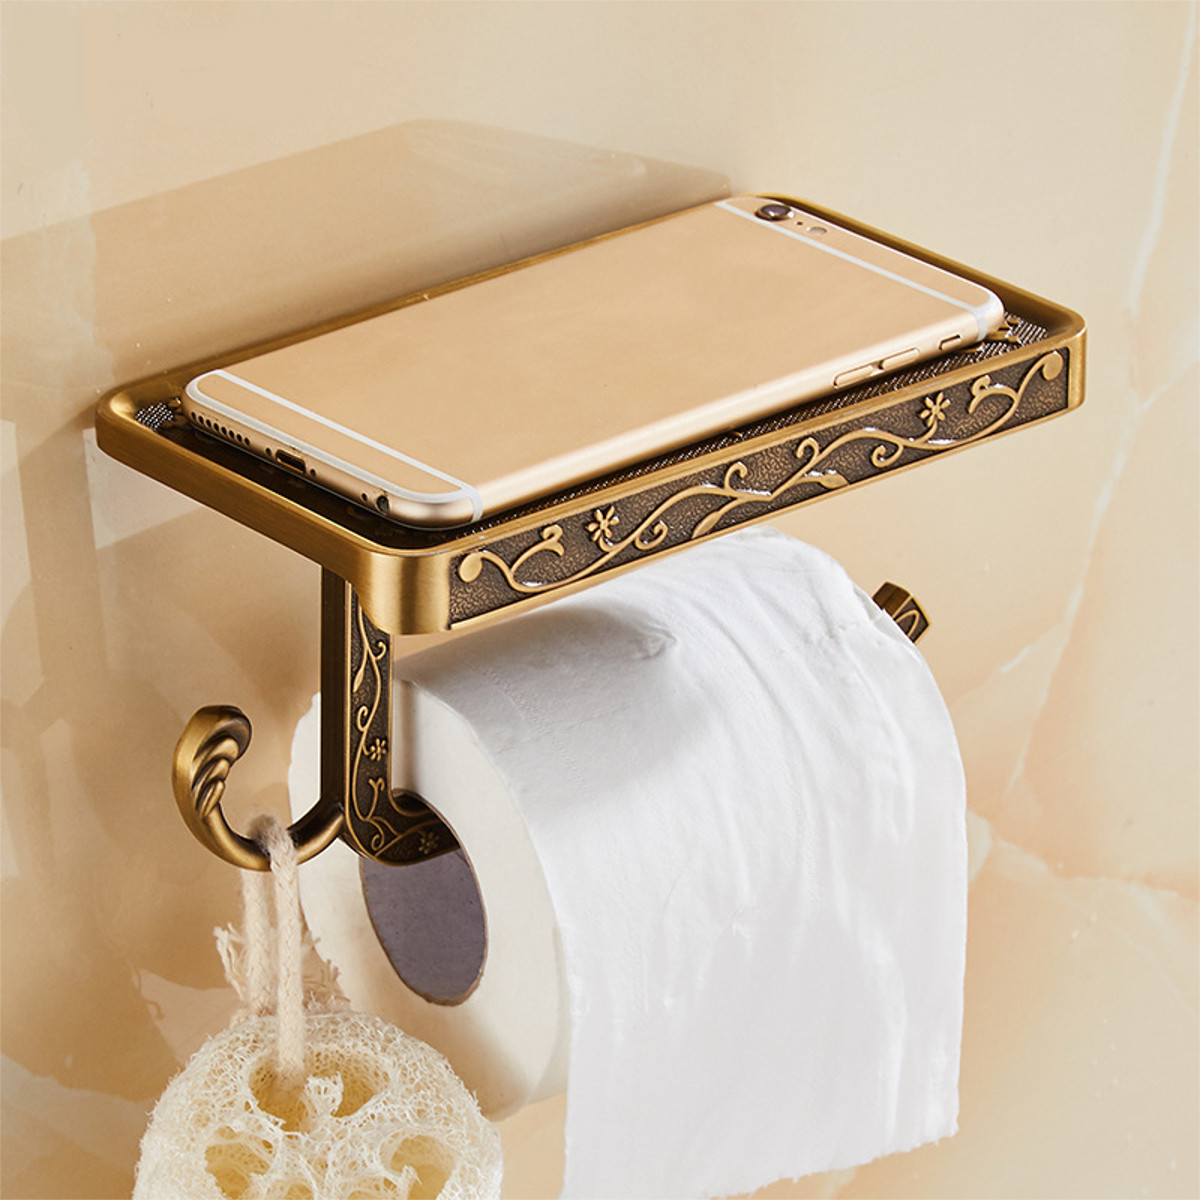 Antique Carved Zinc Alloy Bathroom Paper Mobile Phone Holder With Shelf Bathroom Towel Rack Toilet Paper Holder Tissue Boxes